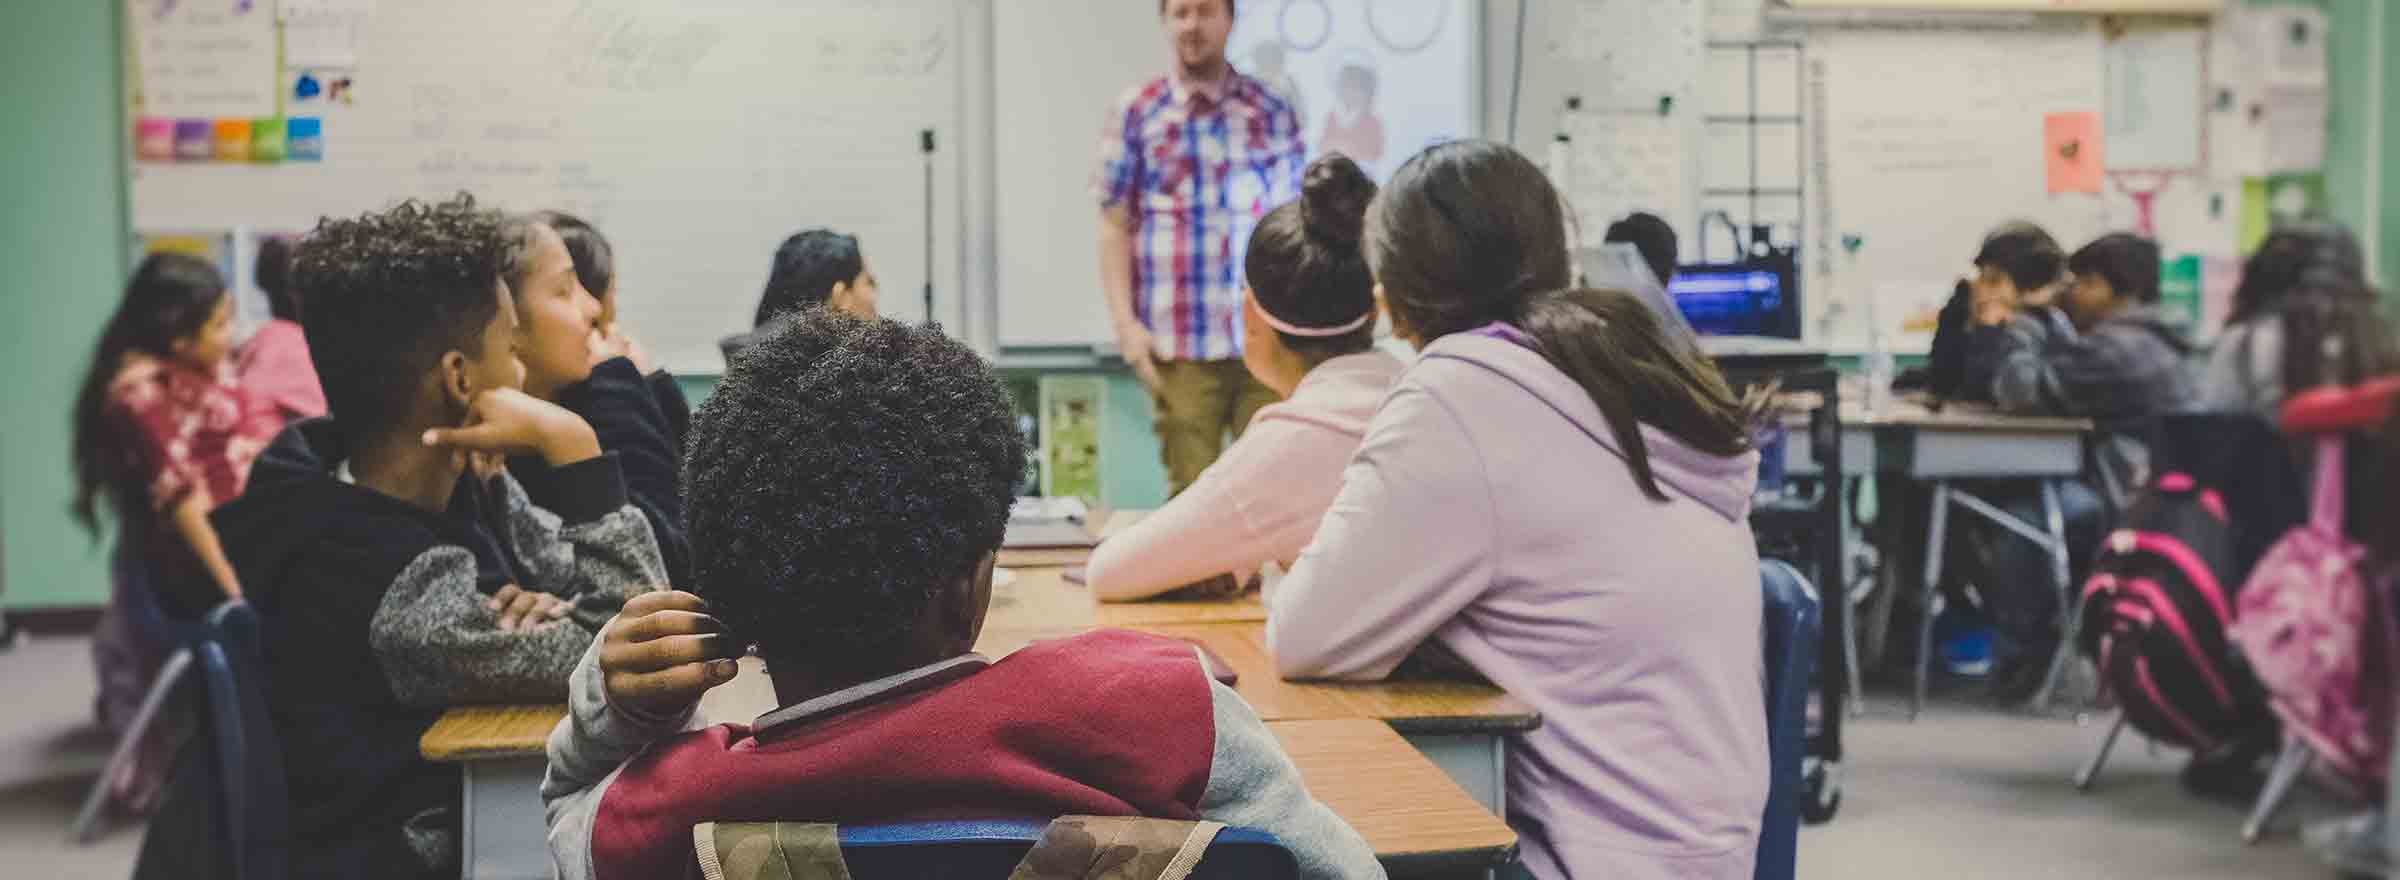 a classroom with diverse students, representing how nonprofits can bridge the digital divide